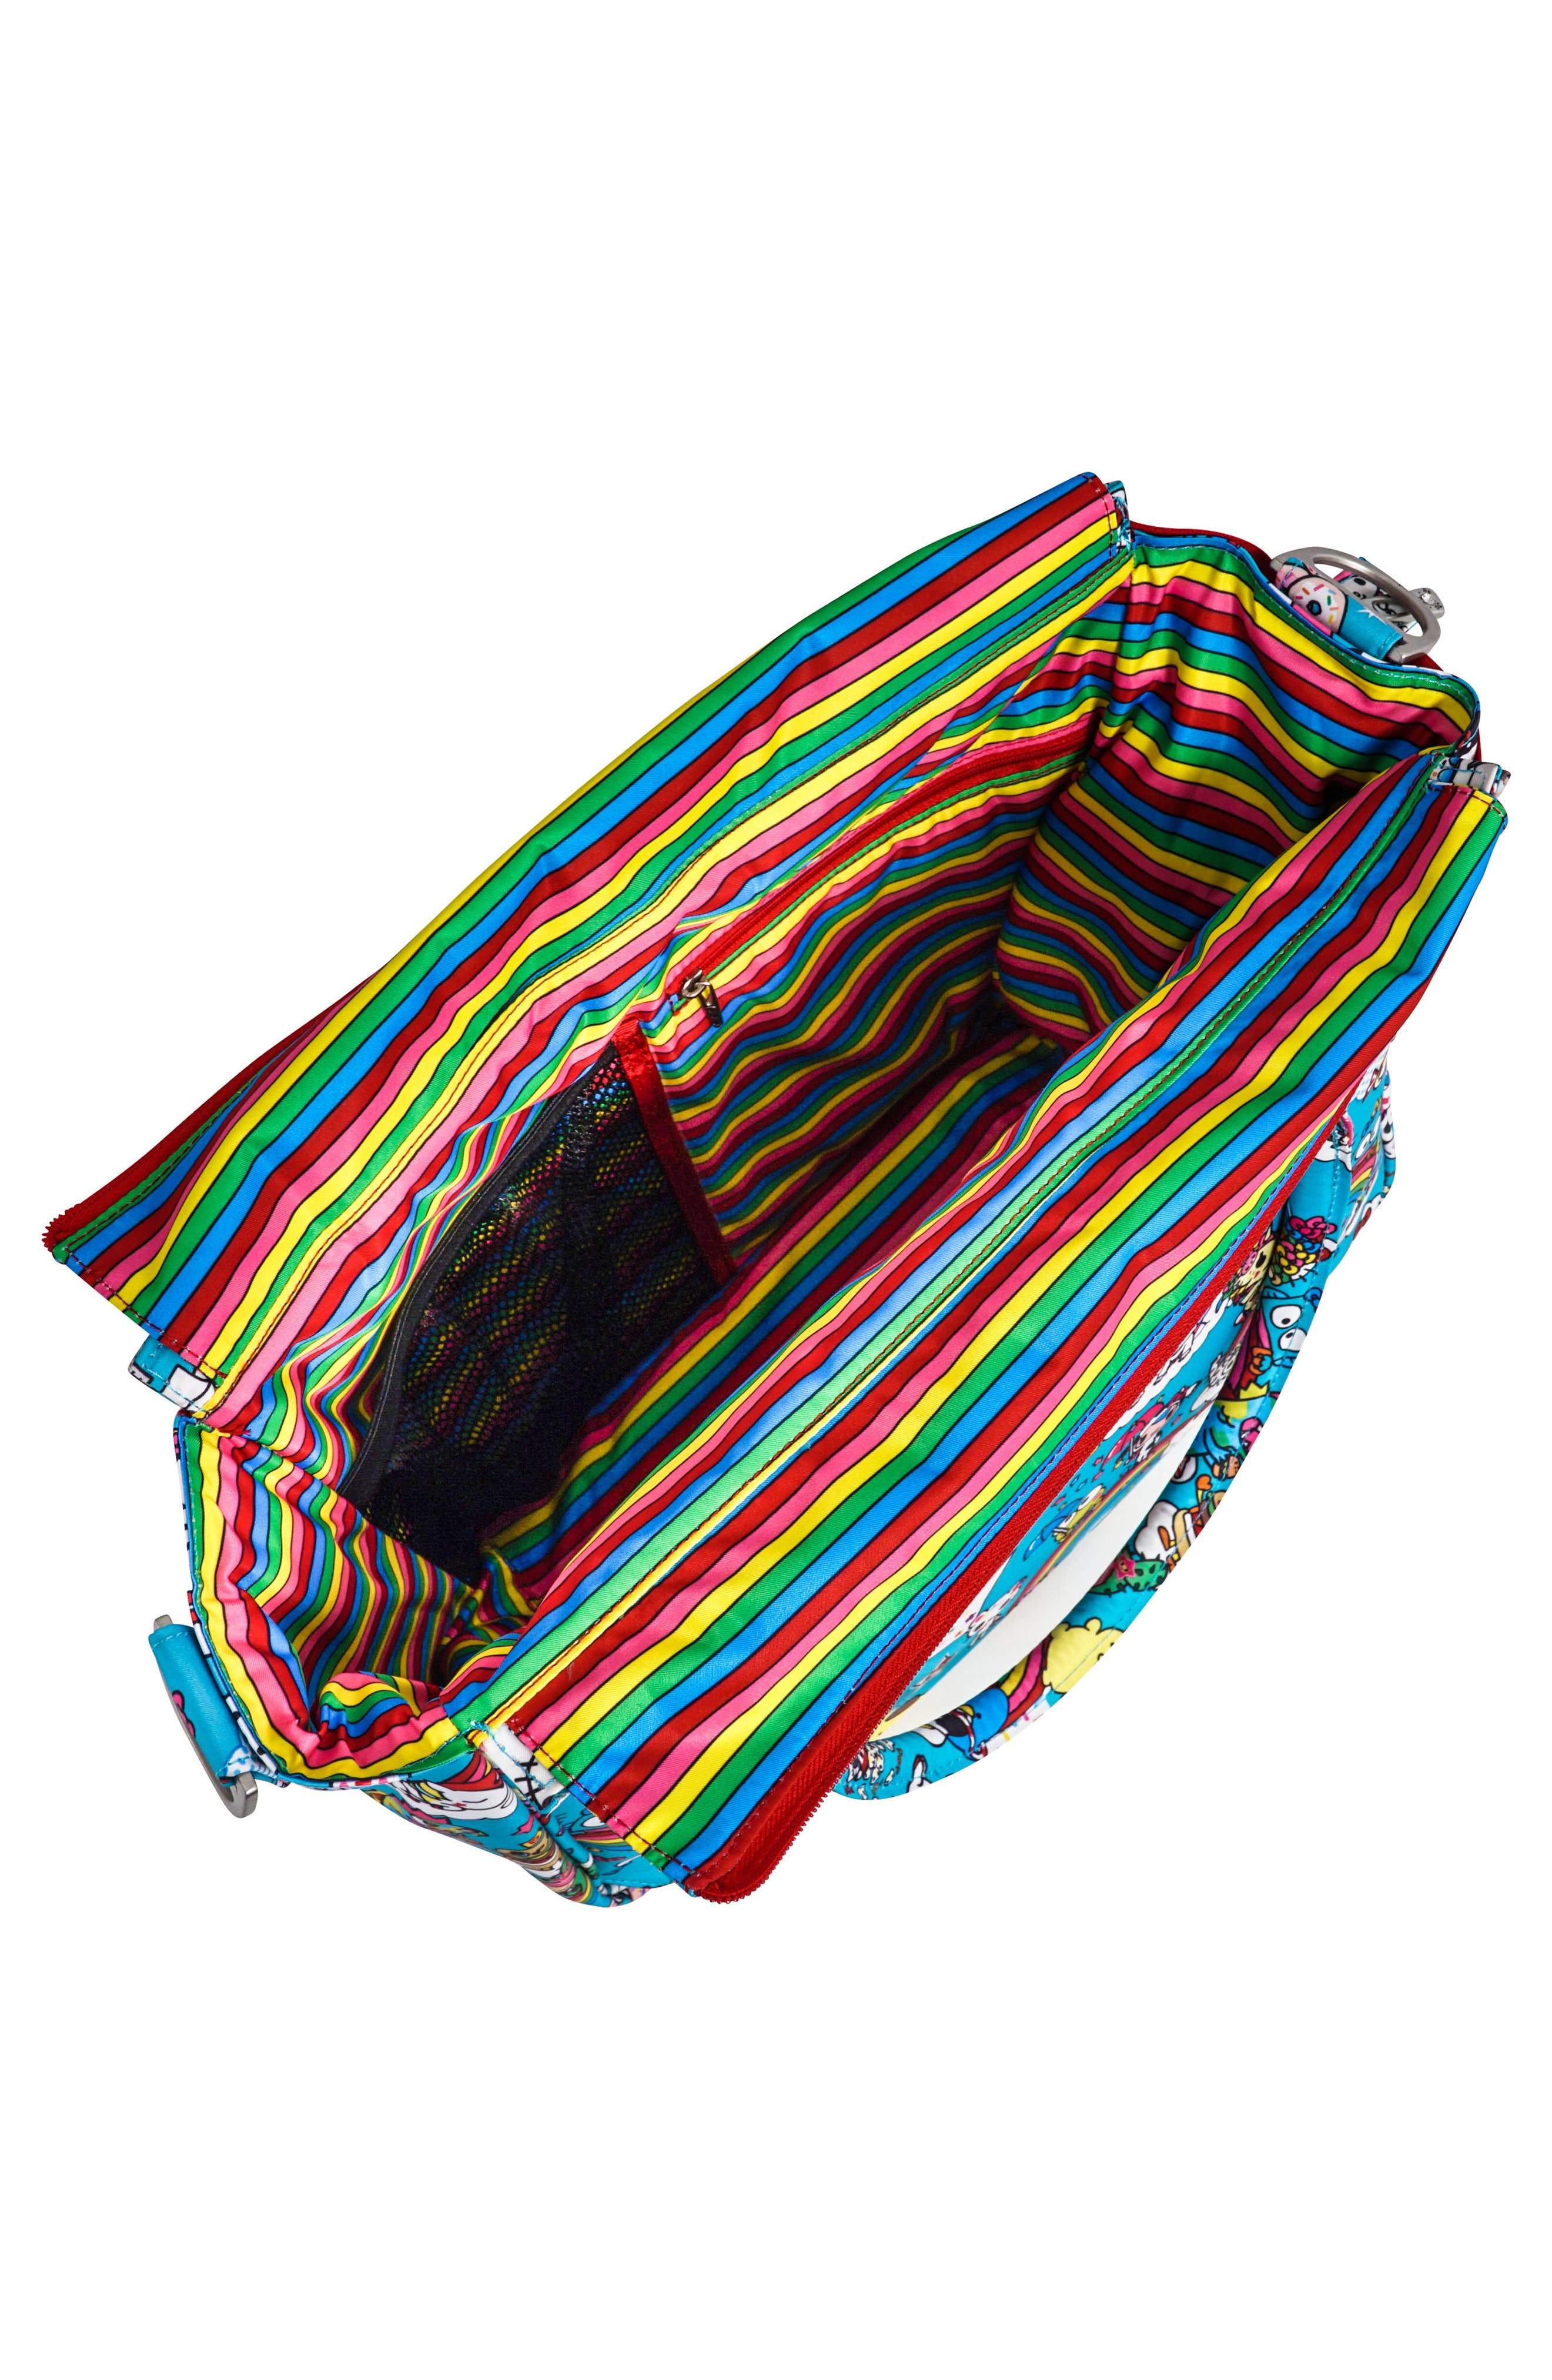 x tokidoki for Hello Sanrio Rainbow Dreams Sporty Diaper Backpack,                             Alternate thumbnail 3, color,                             Rainbow Dreams